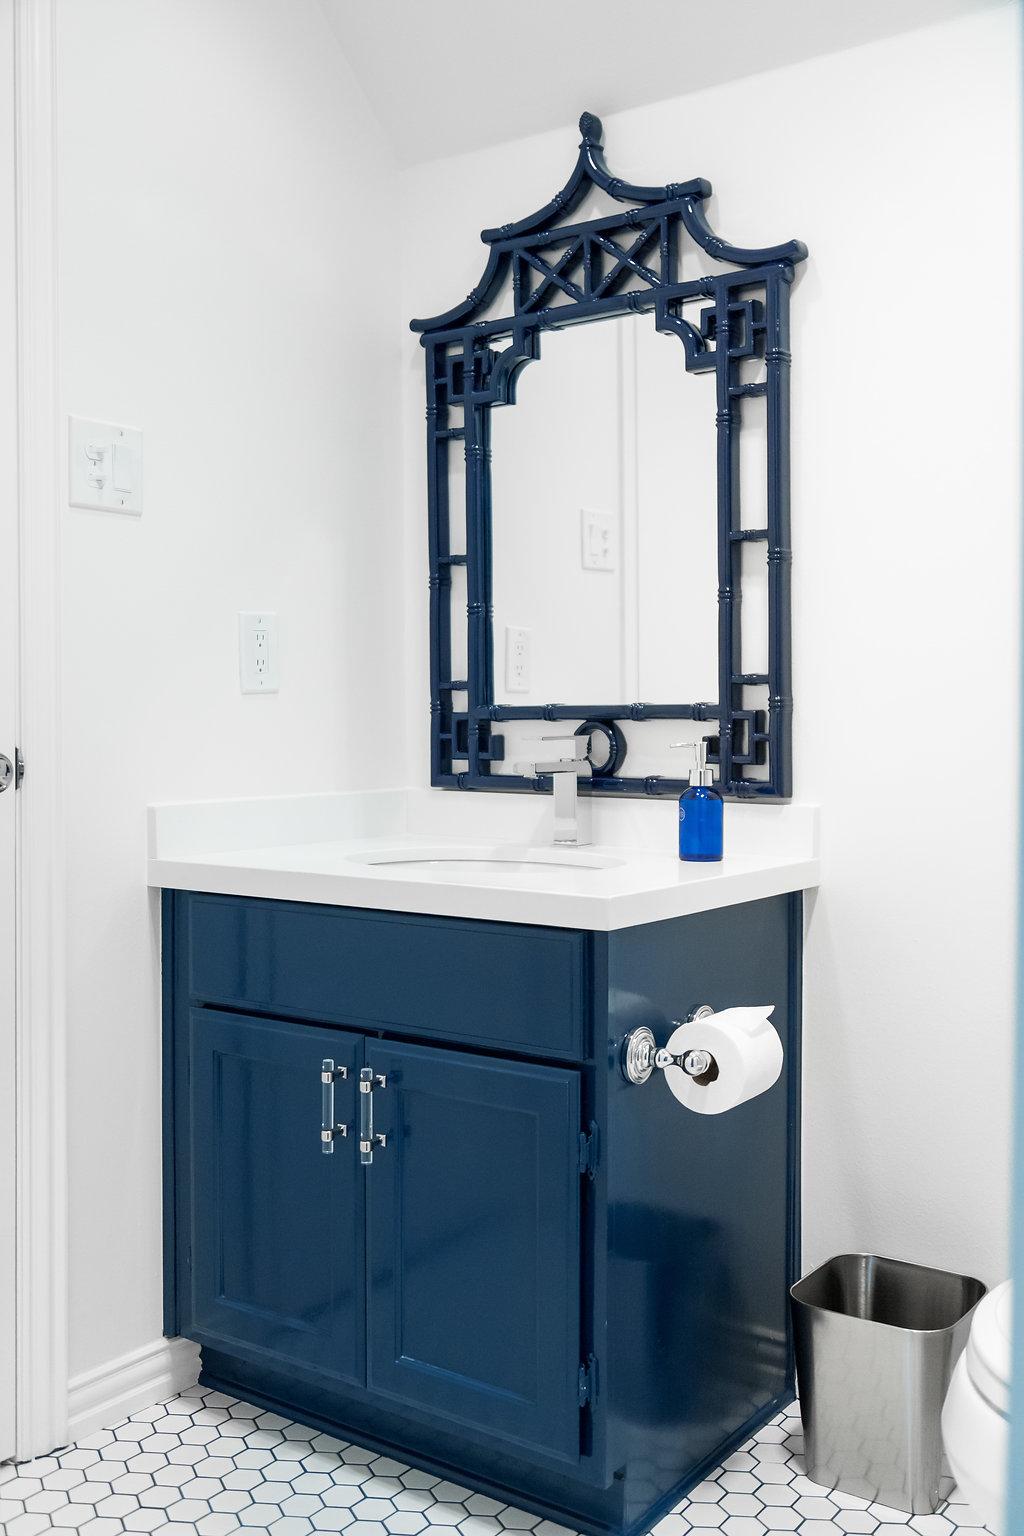 Dallas Renovation, Pool Bath, Navy and White Bath, #Wayfair1roomreno, Navy Pagoda mirror